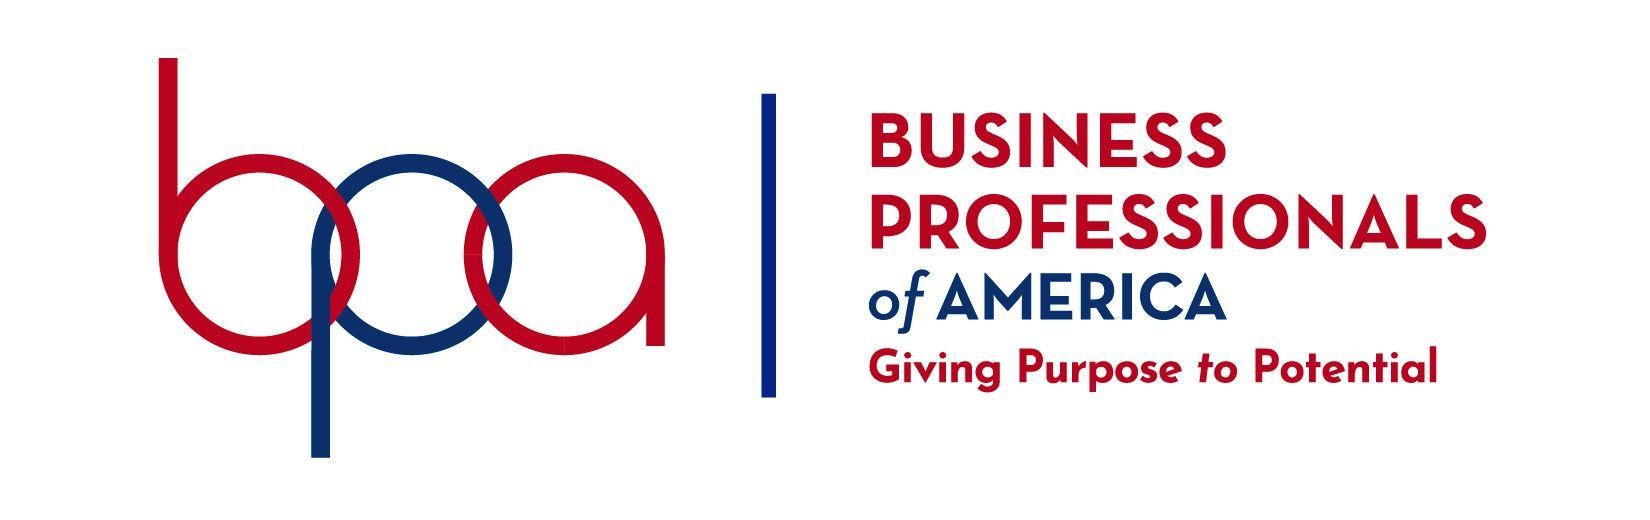 Business Professionals of America Logo